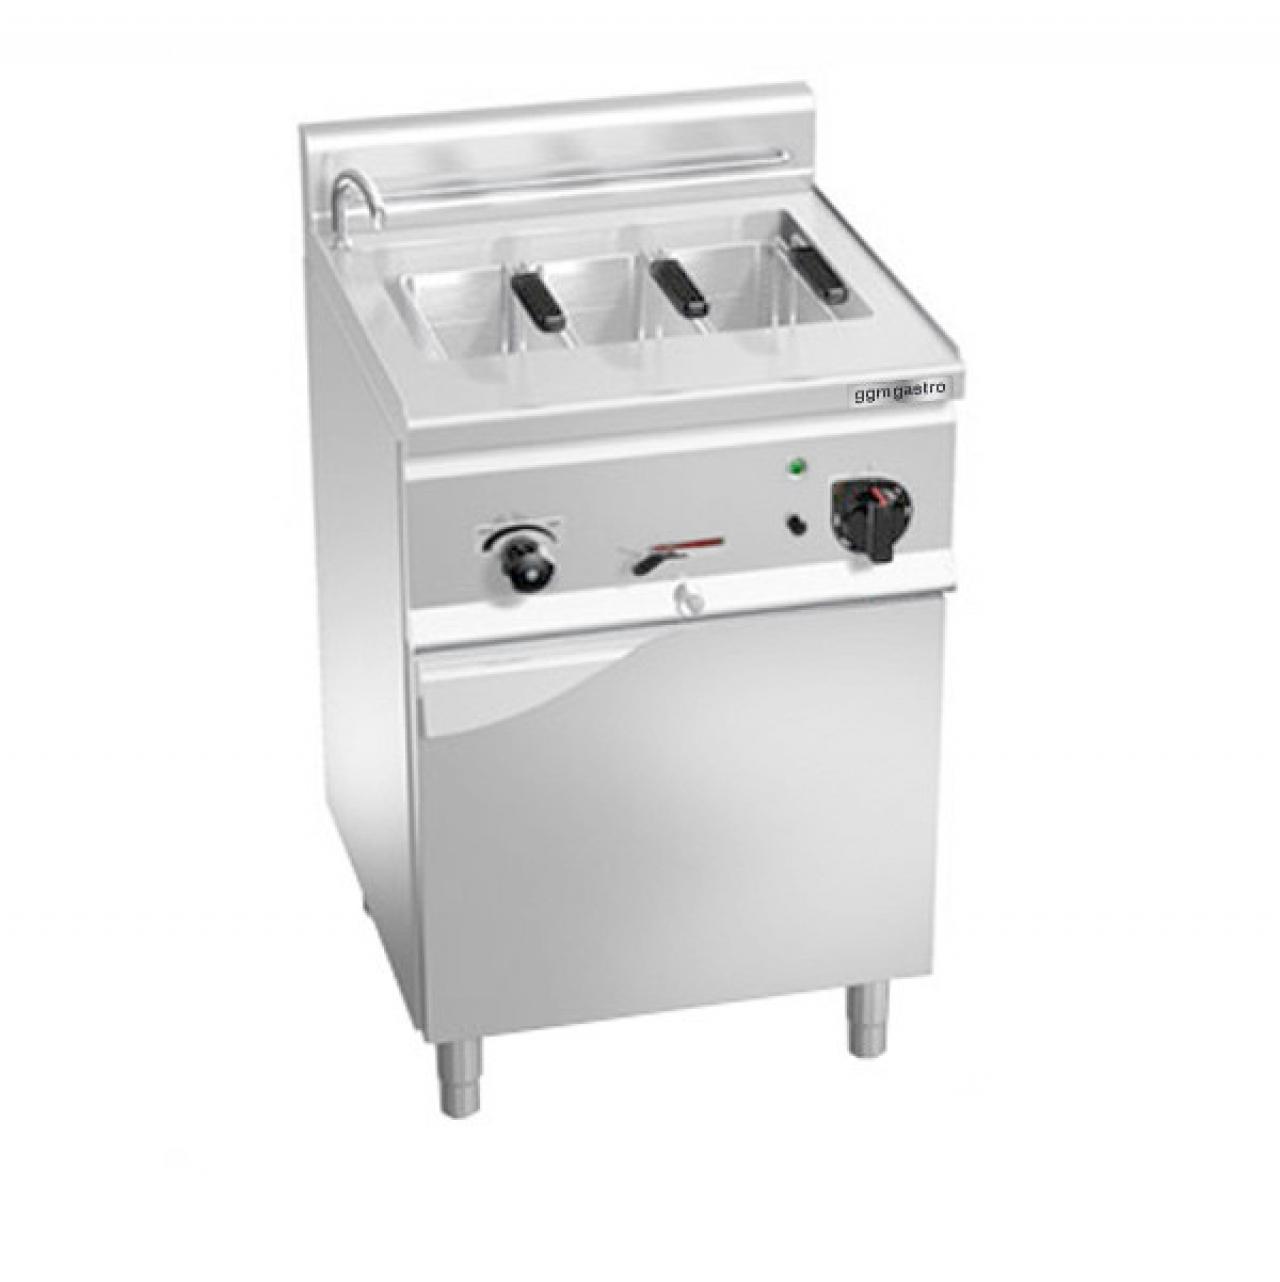 pasta cooker 25L